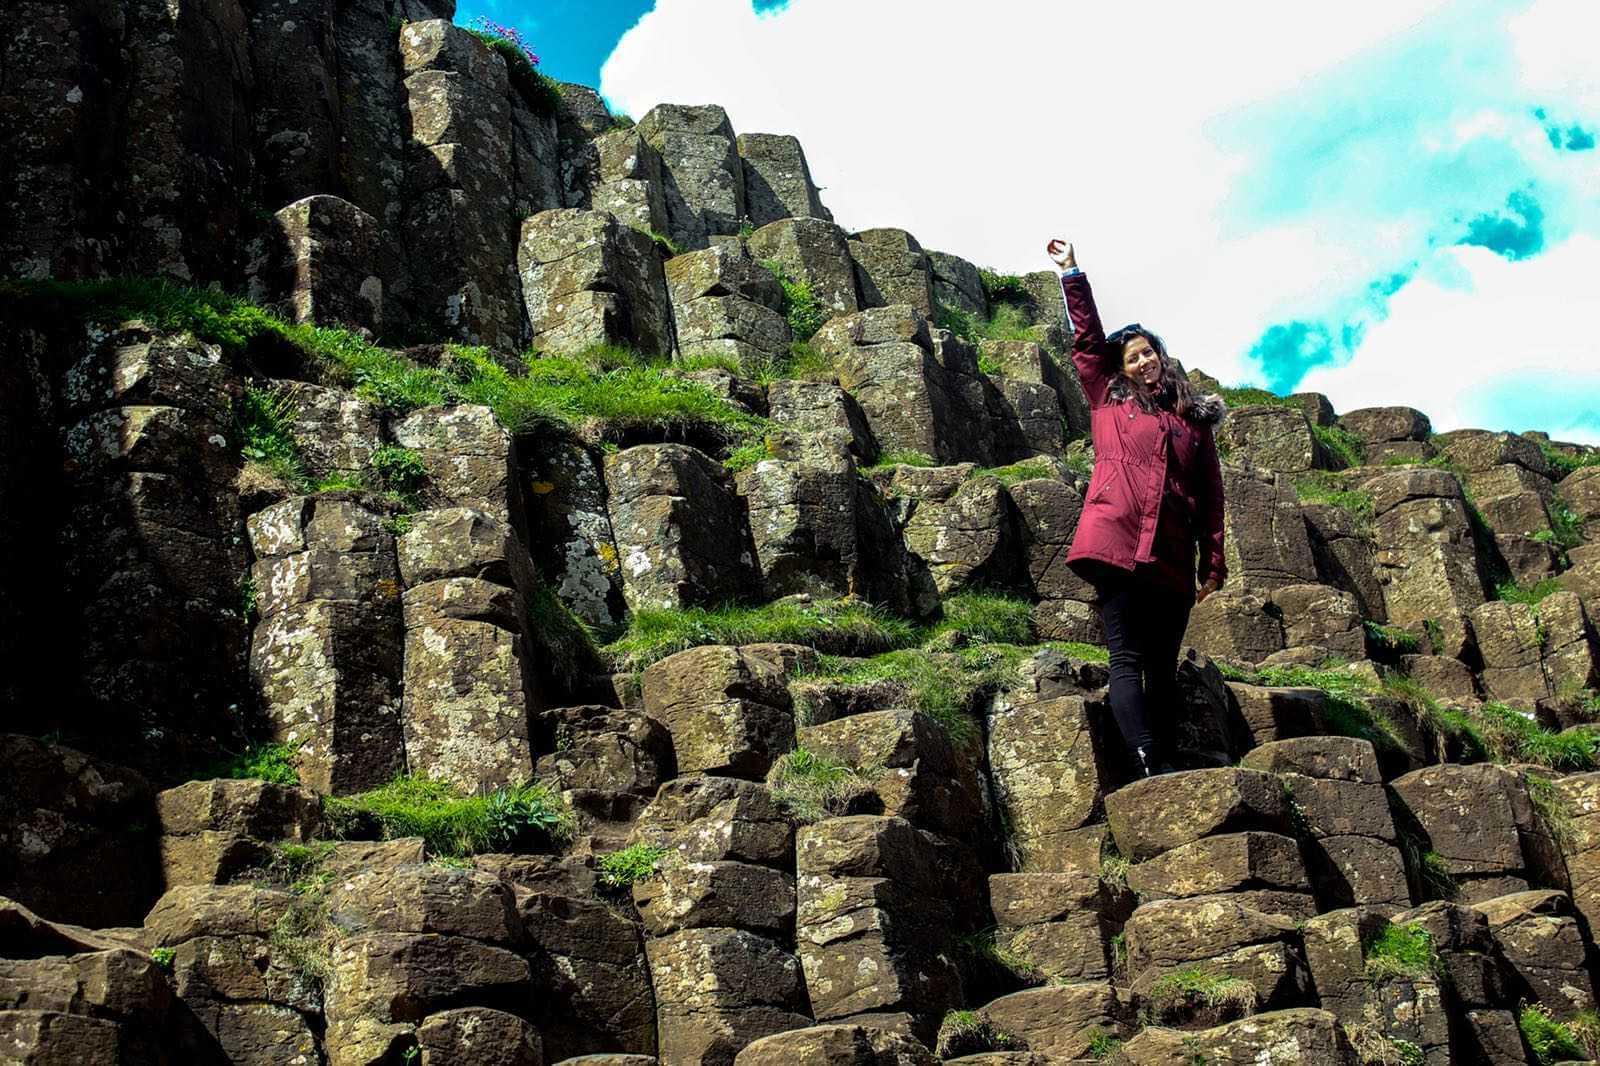 Climbing-around-Giants-Causeway